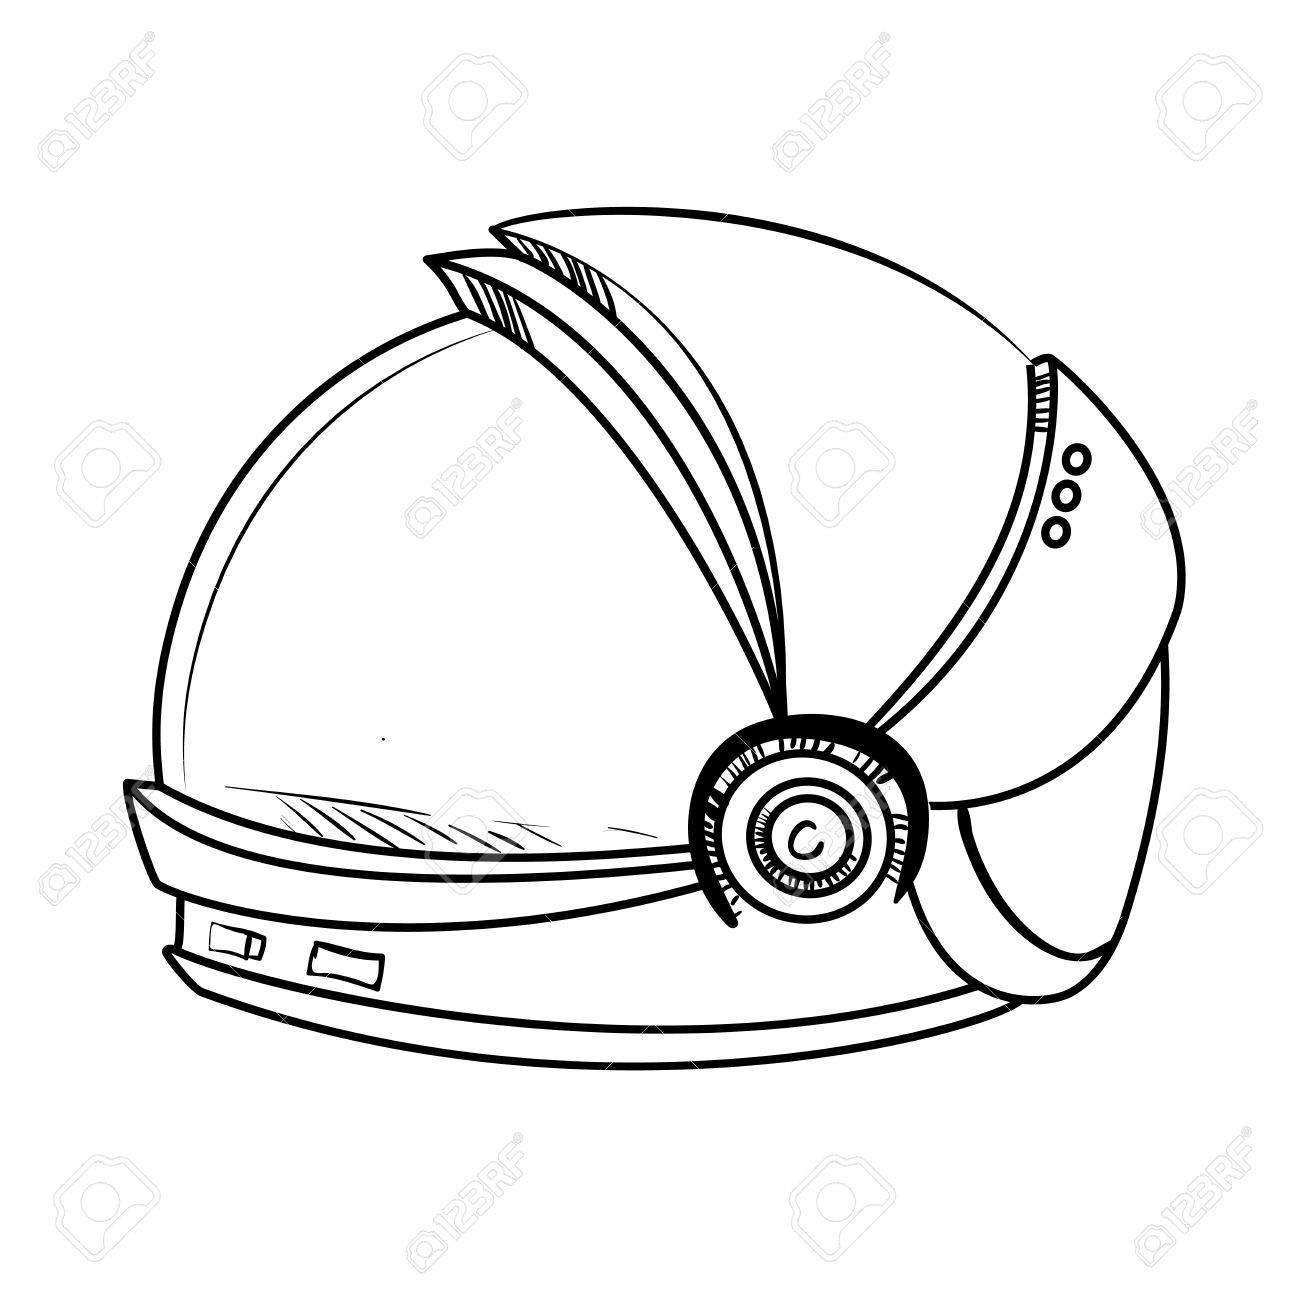 1418 Astronaut free clipart.